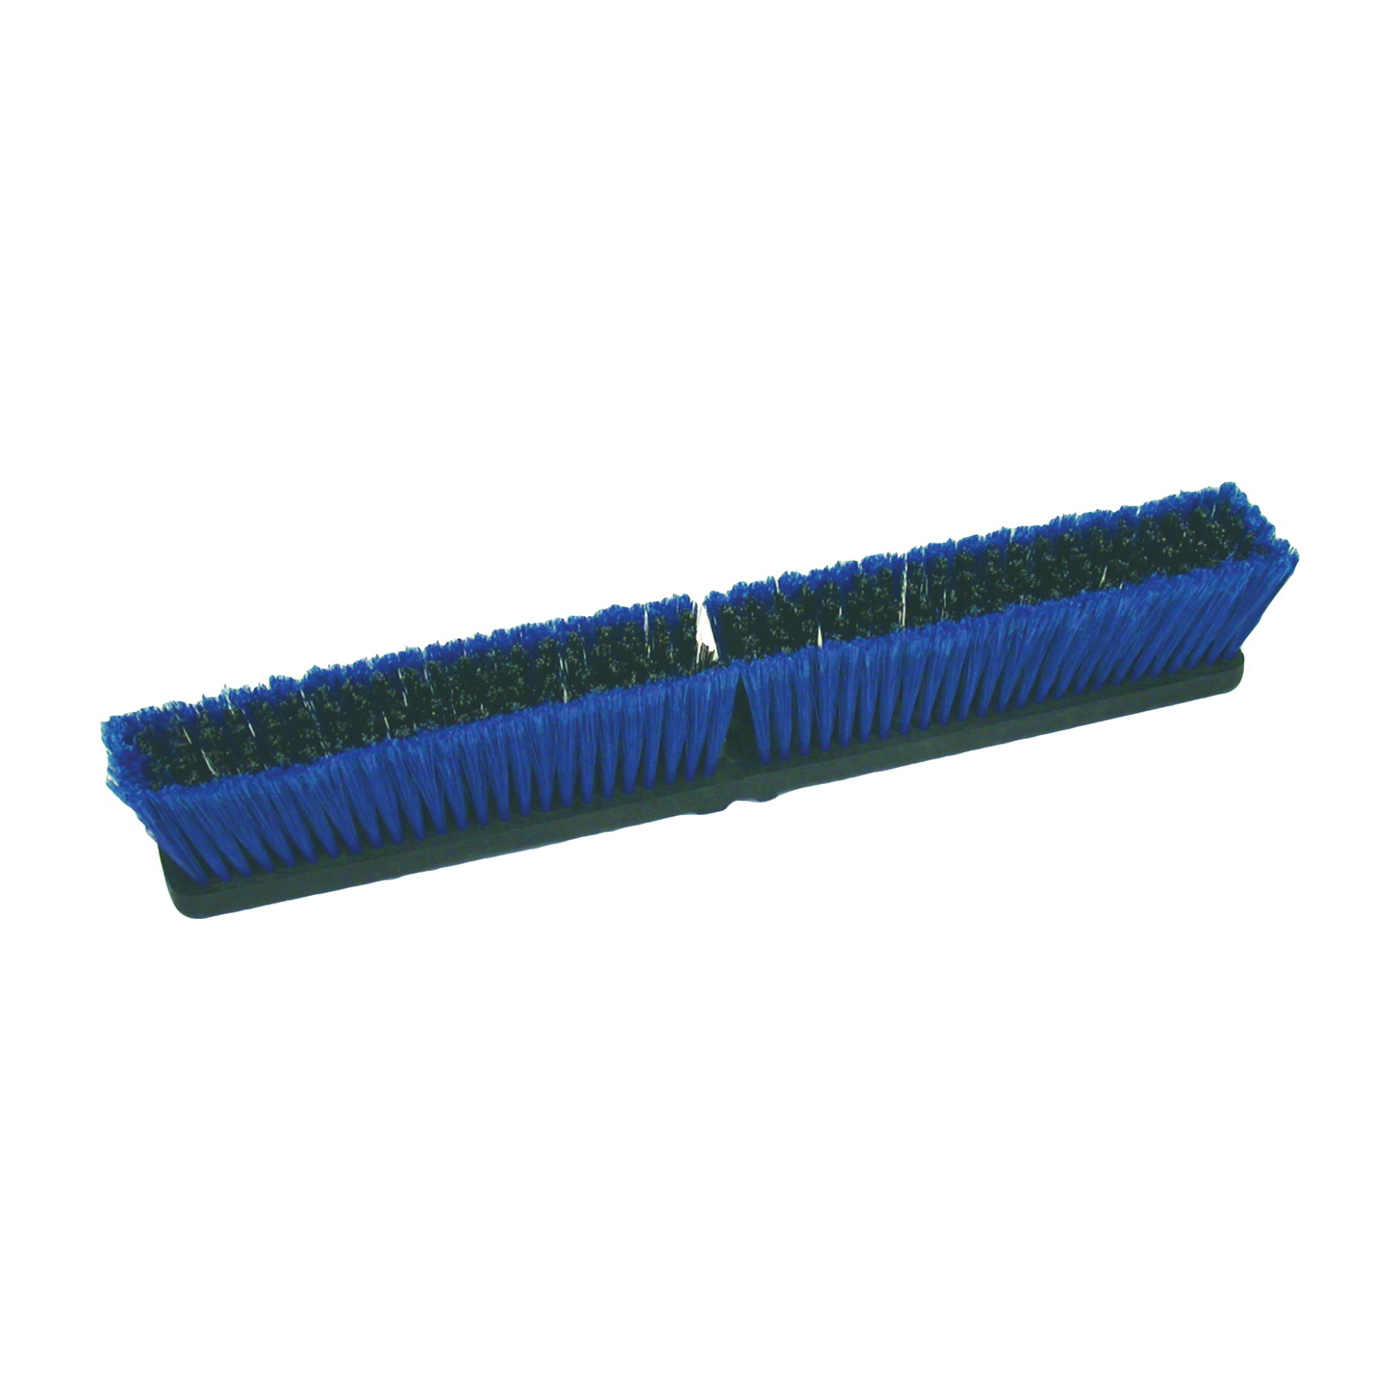 Picture of BIRDWELL 2028-12 Broom Head Threaded, Threaded, 3 in L Trim, Polypropylene/Polystyrene Bristle, Black